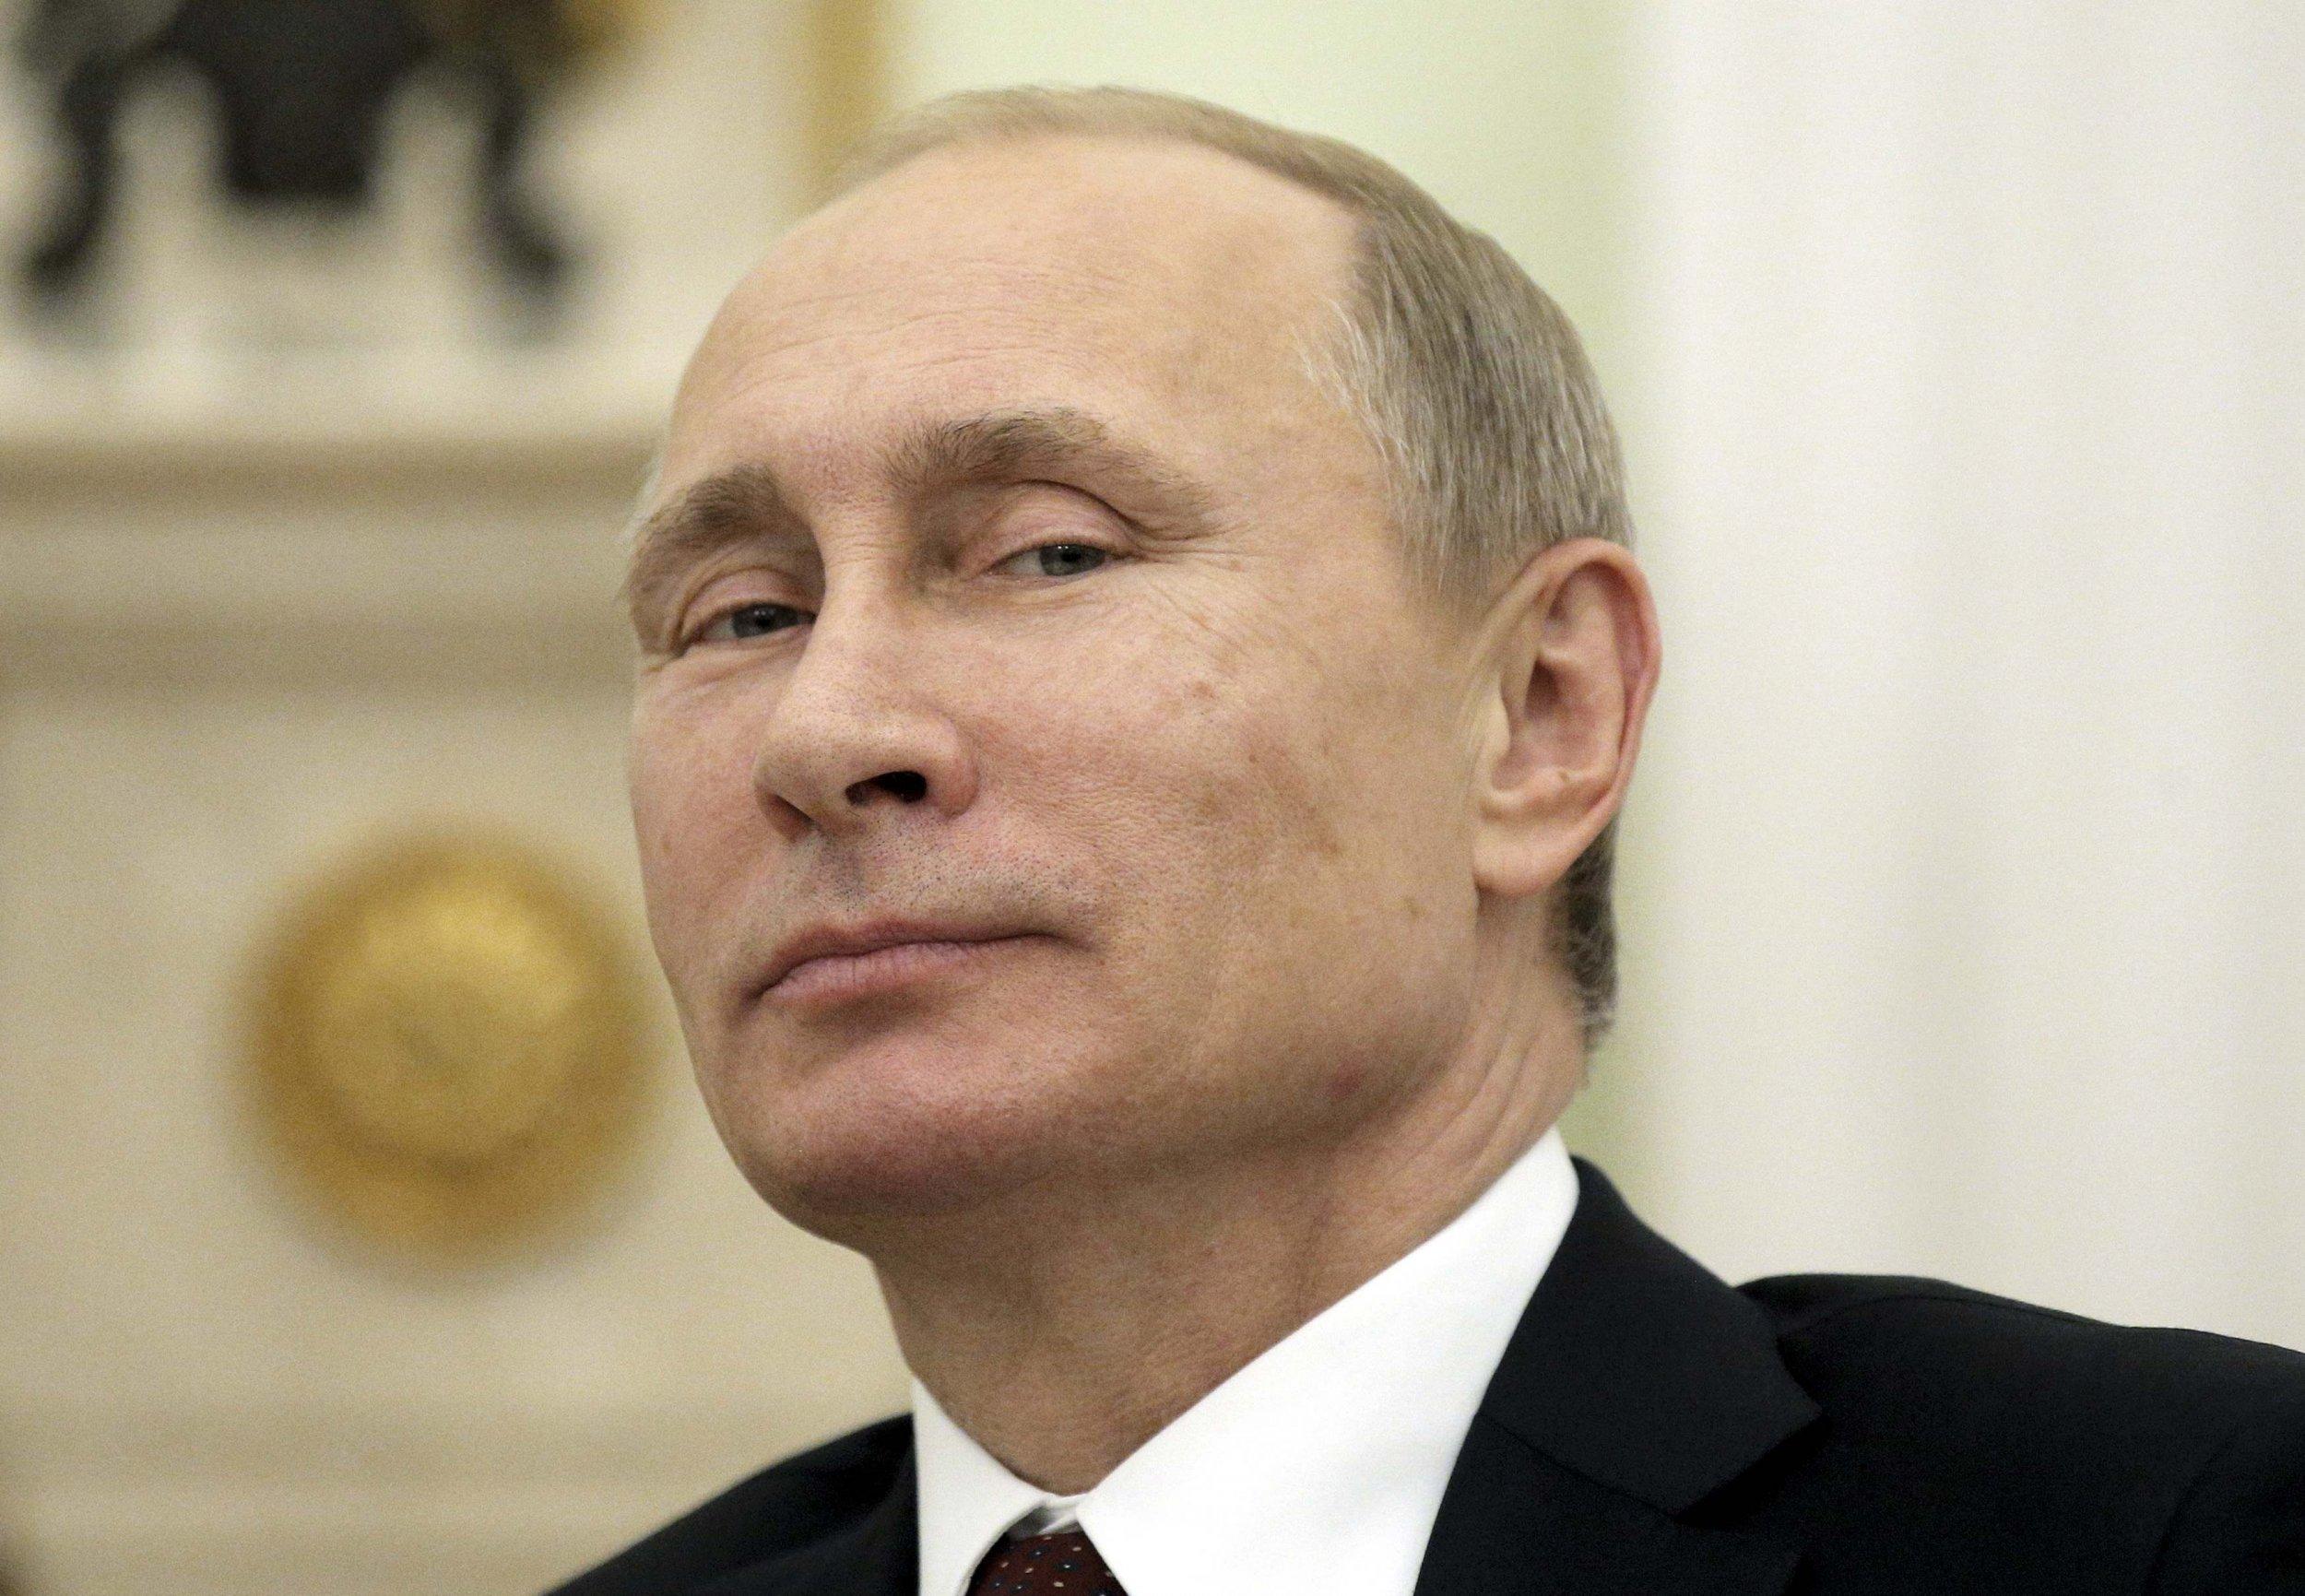 2014-12-22T194543Z_744380455_GM1EACN0ADV01_RTRMADP_3_RUSSIA-POLITICS